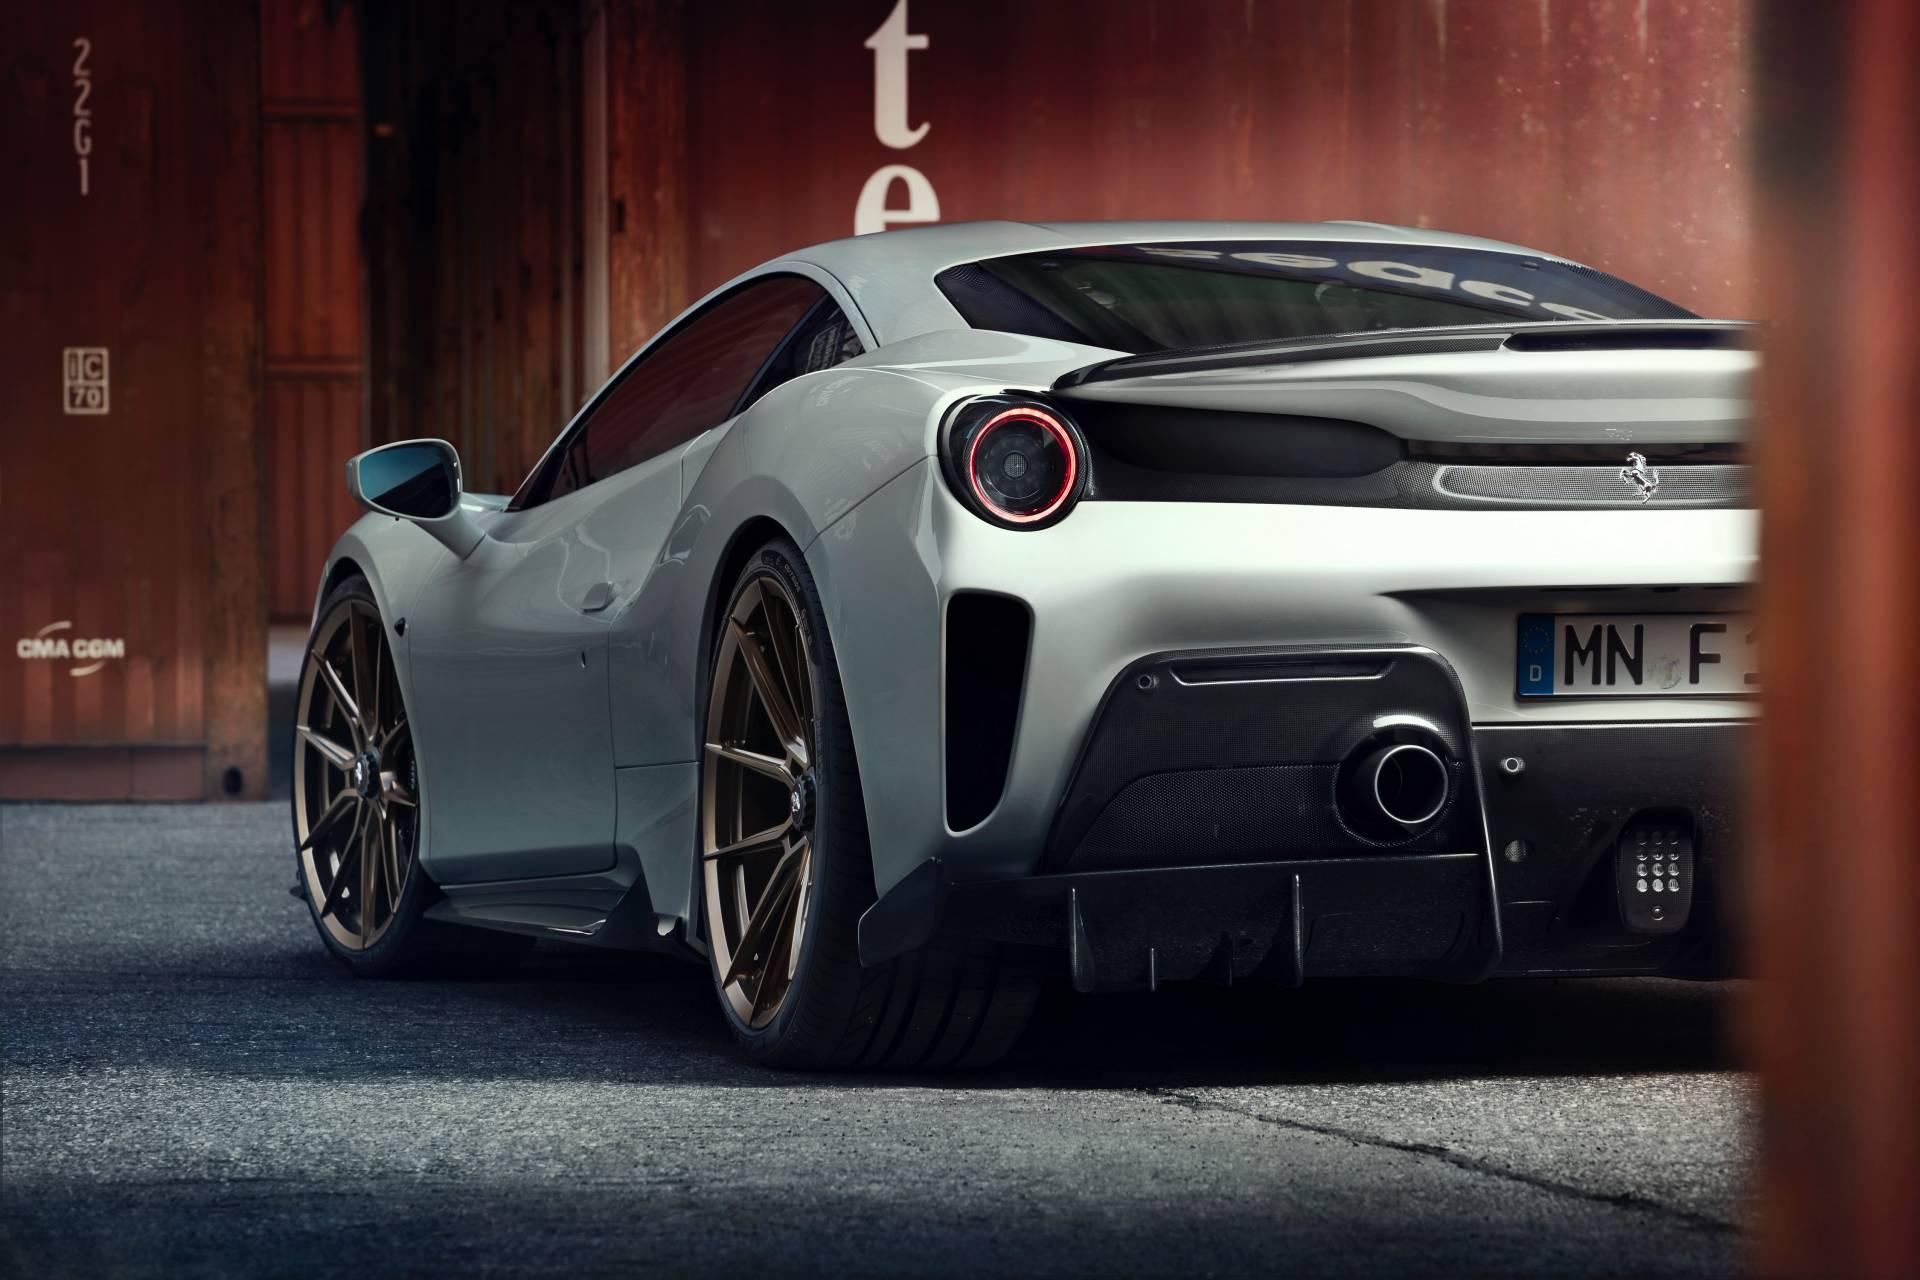 Ferrari-488-Pista-by-Novitec-12